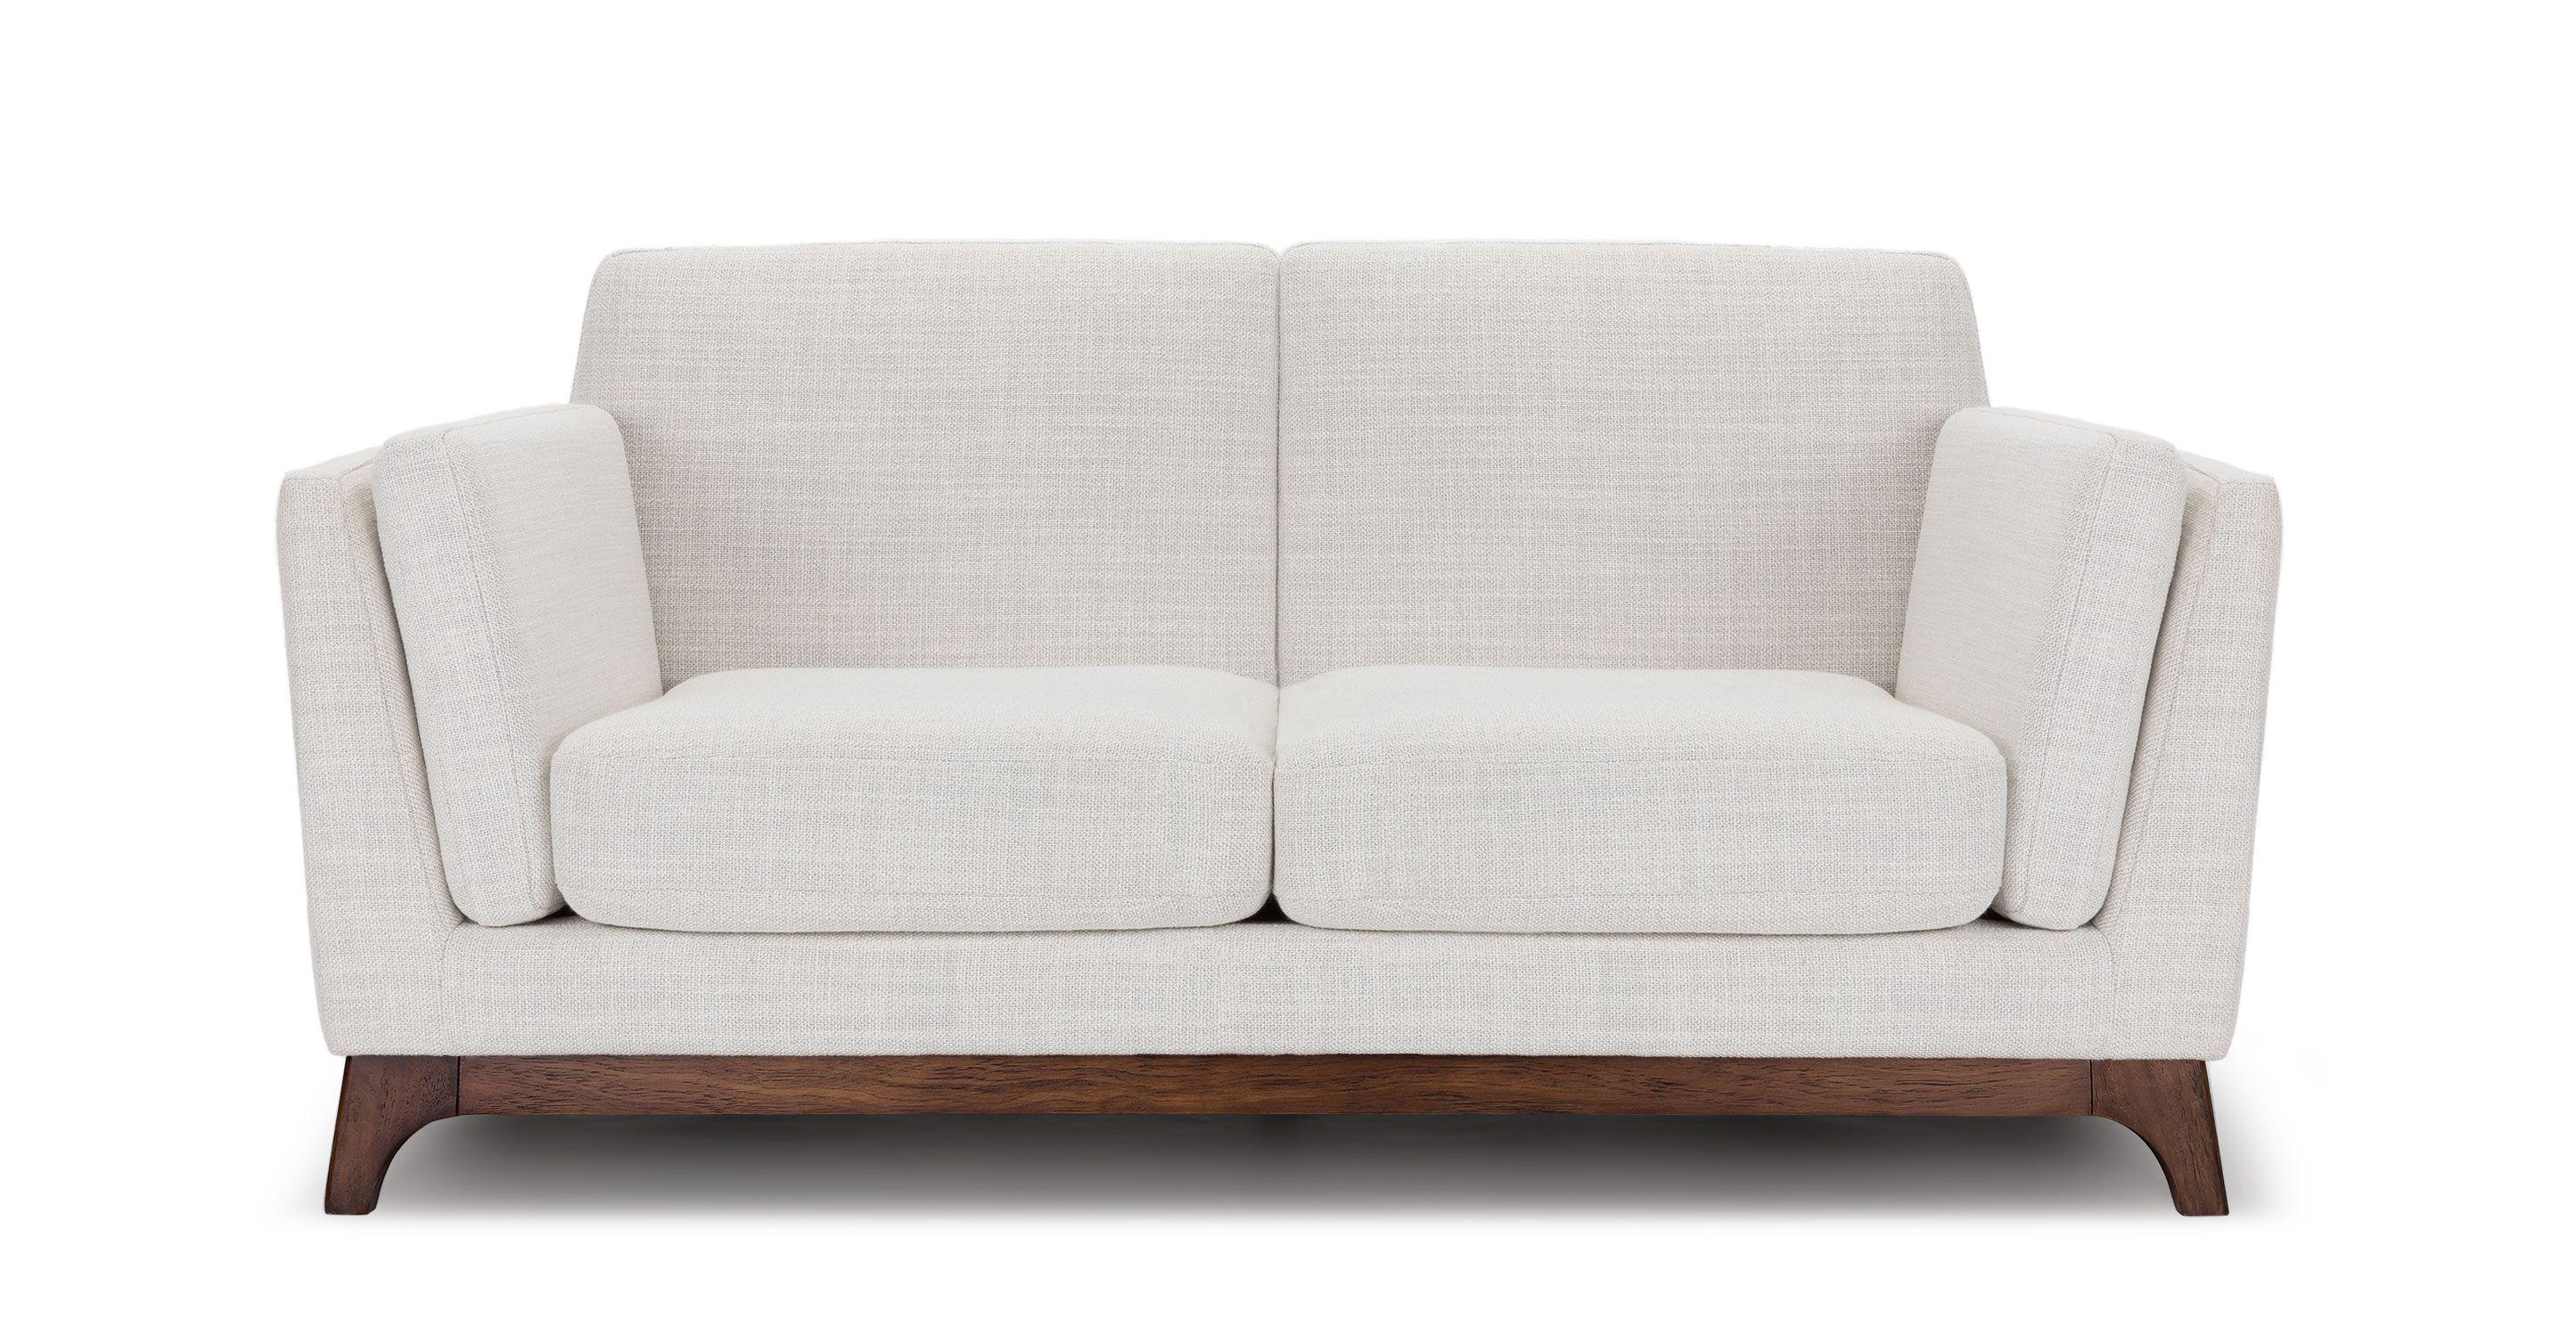 Ikea Us Furniture And Home Furnishings Ikea Sofa Sofa Makeover Ikea Karlstad Sofa